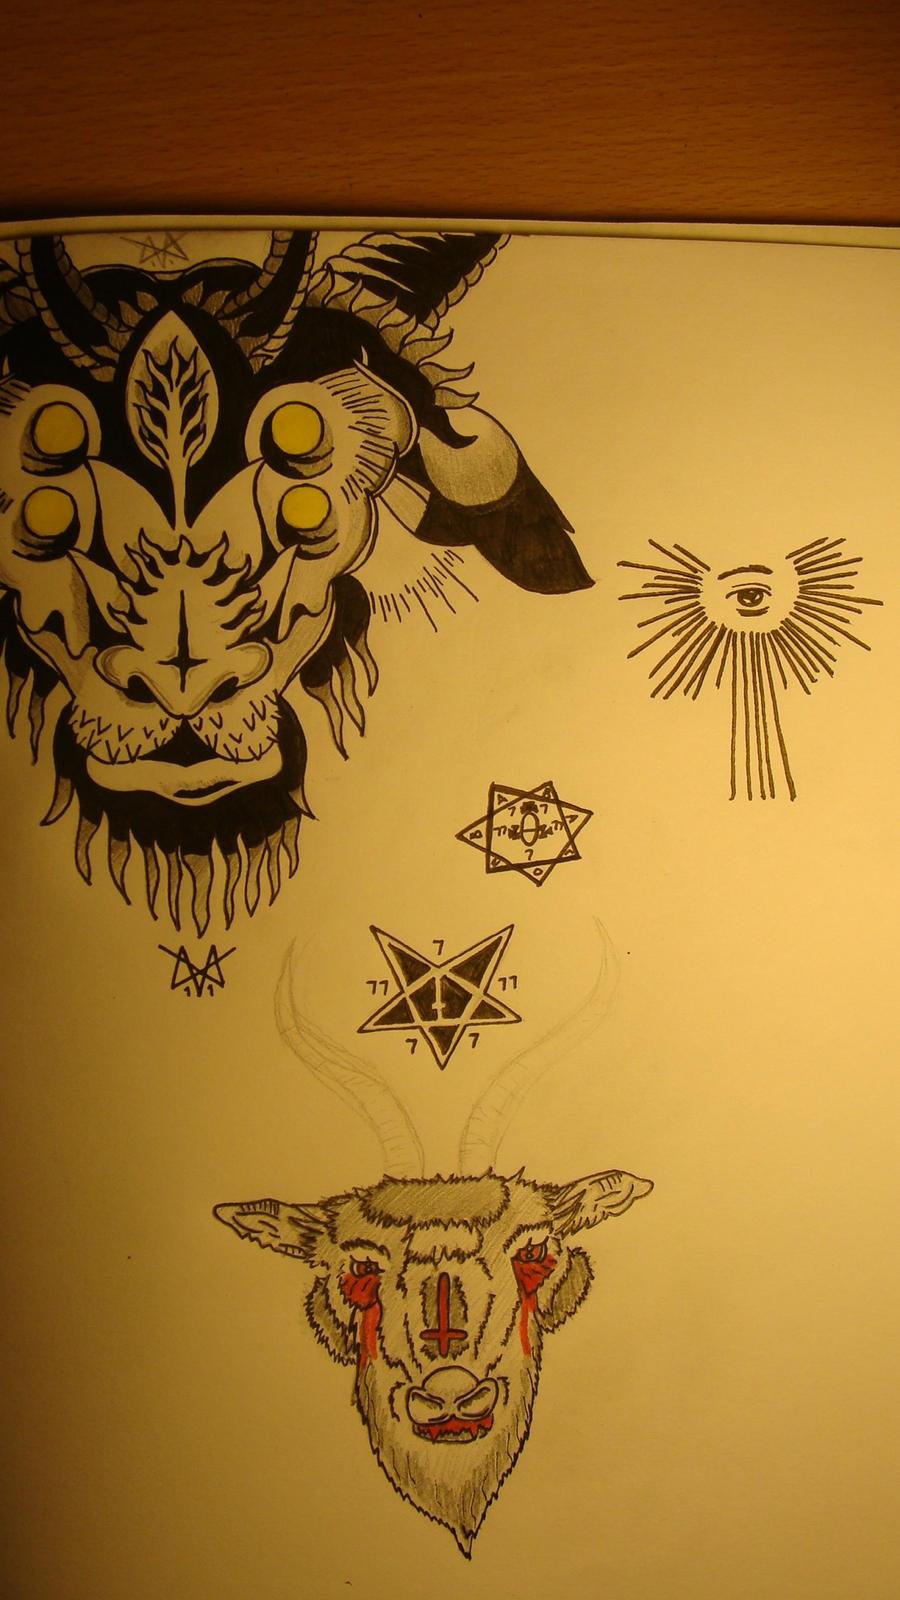 Occult tattoo ideas by VectrGrisham on DeviantArt